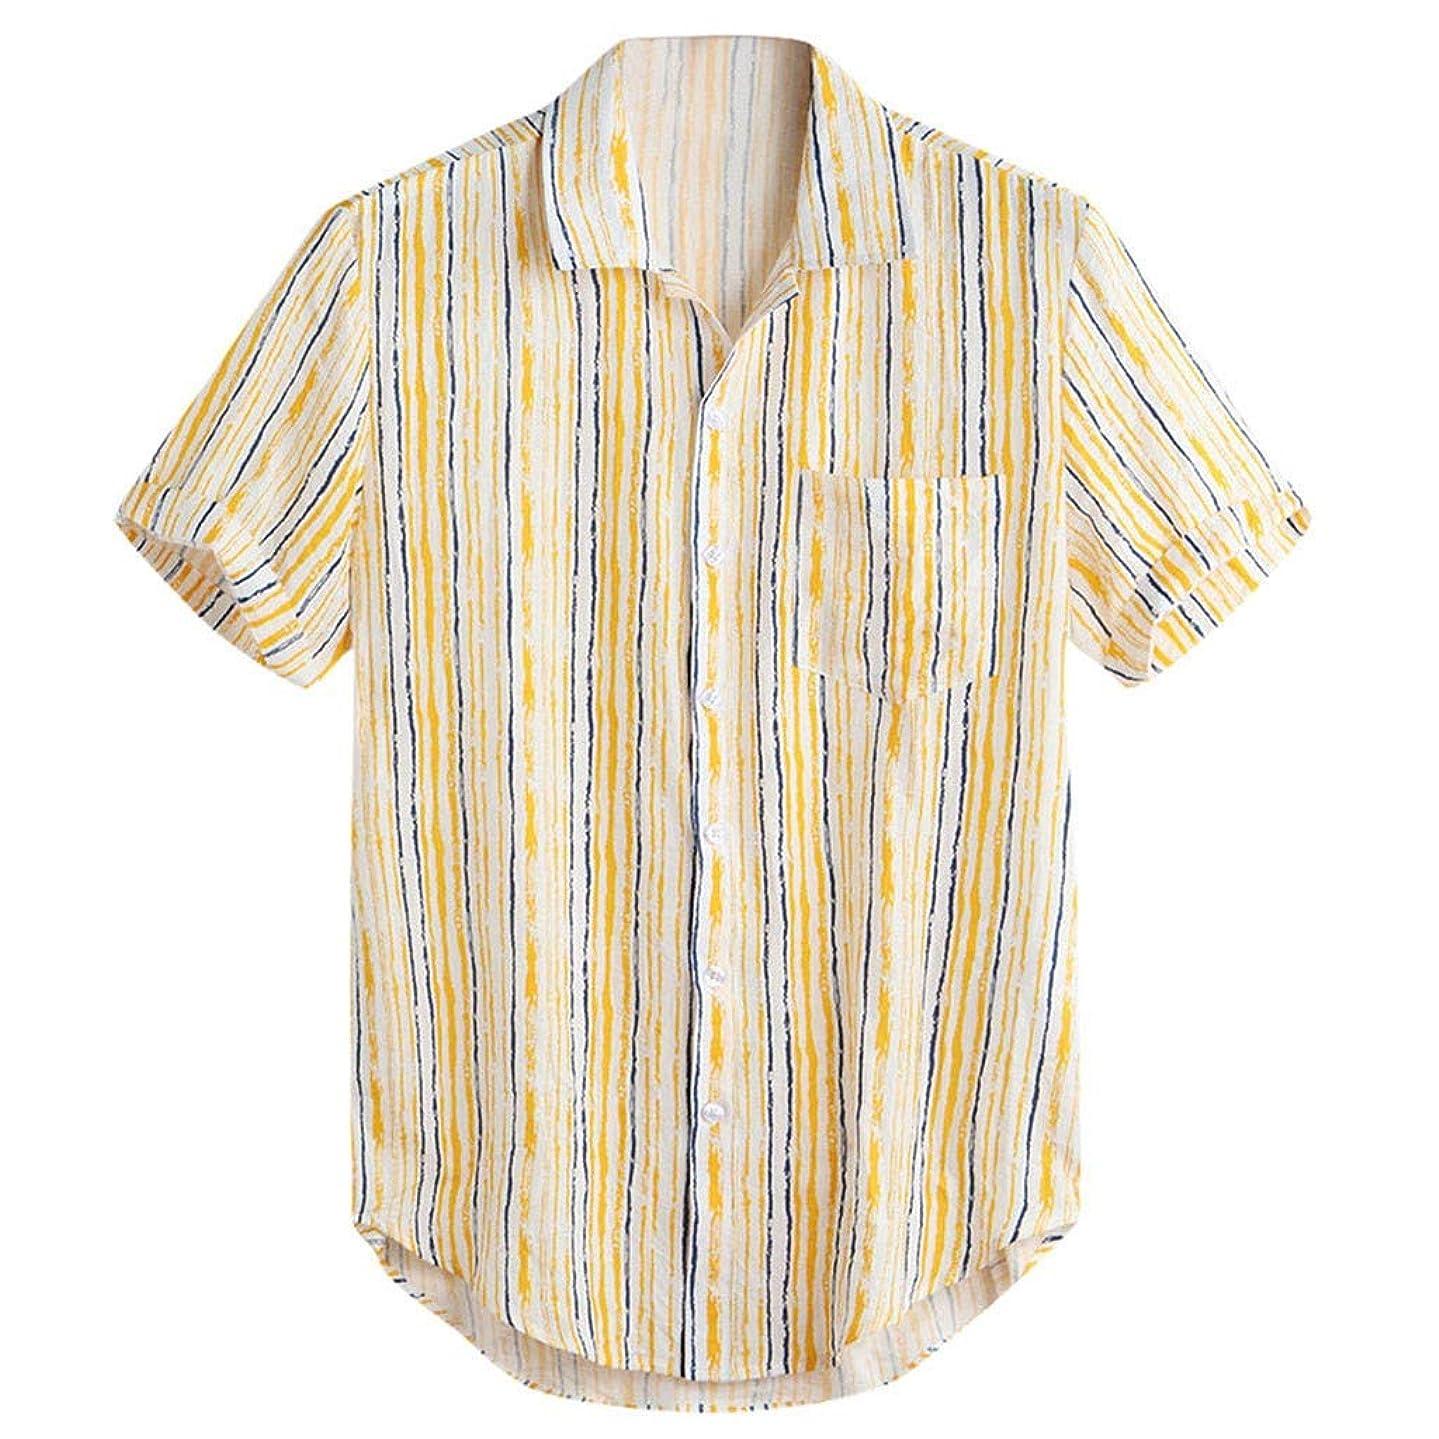 Seaintheson Men's Short Sleeve Shirt,Summer Stripe Print Casual Loose Button Tee Blouse